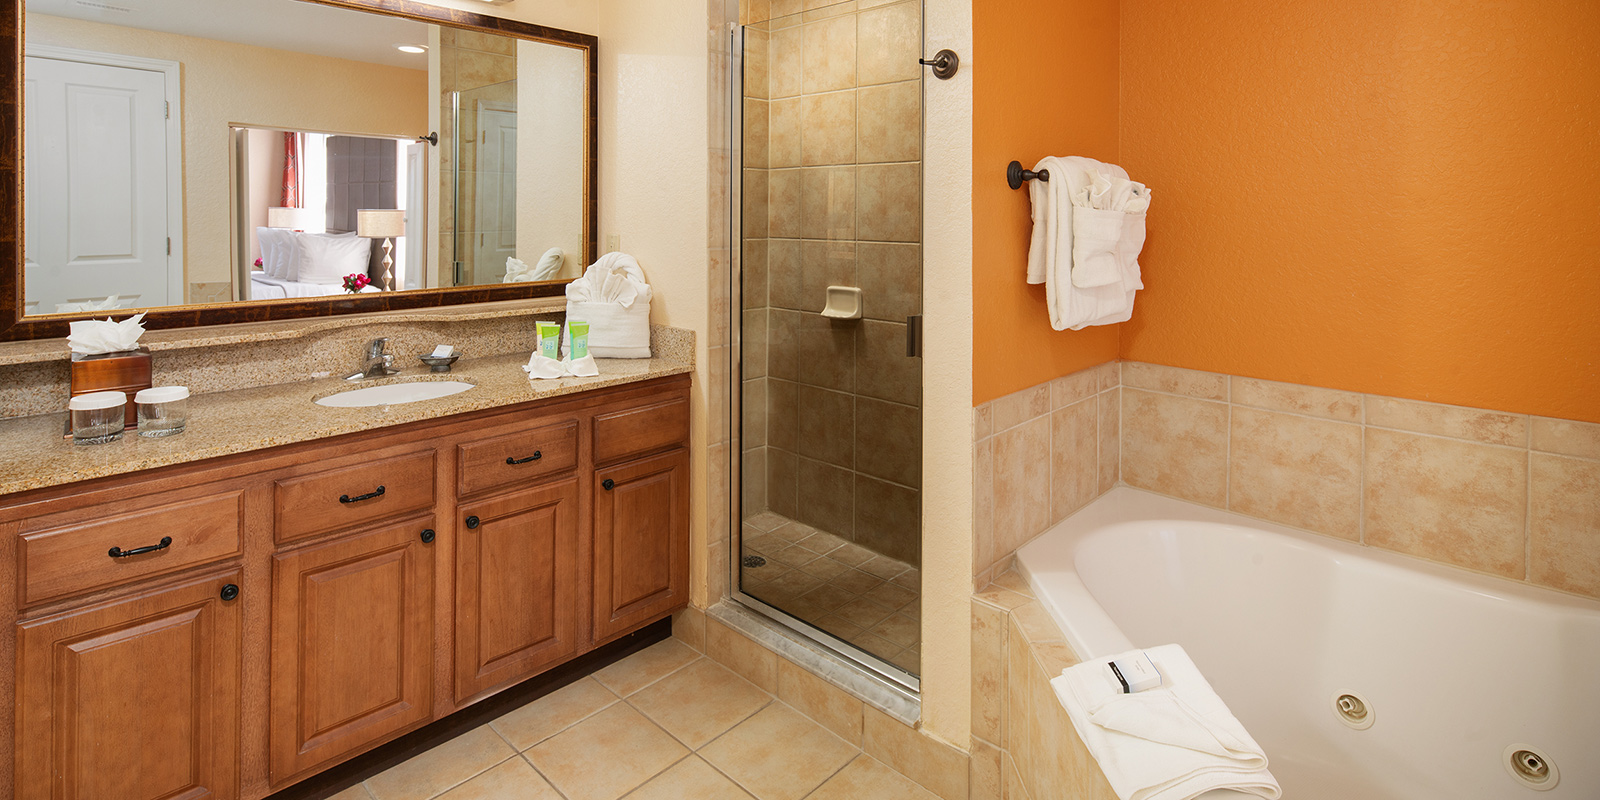 Three Bedroom Apartment Style Suites in Orlando FL